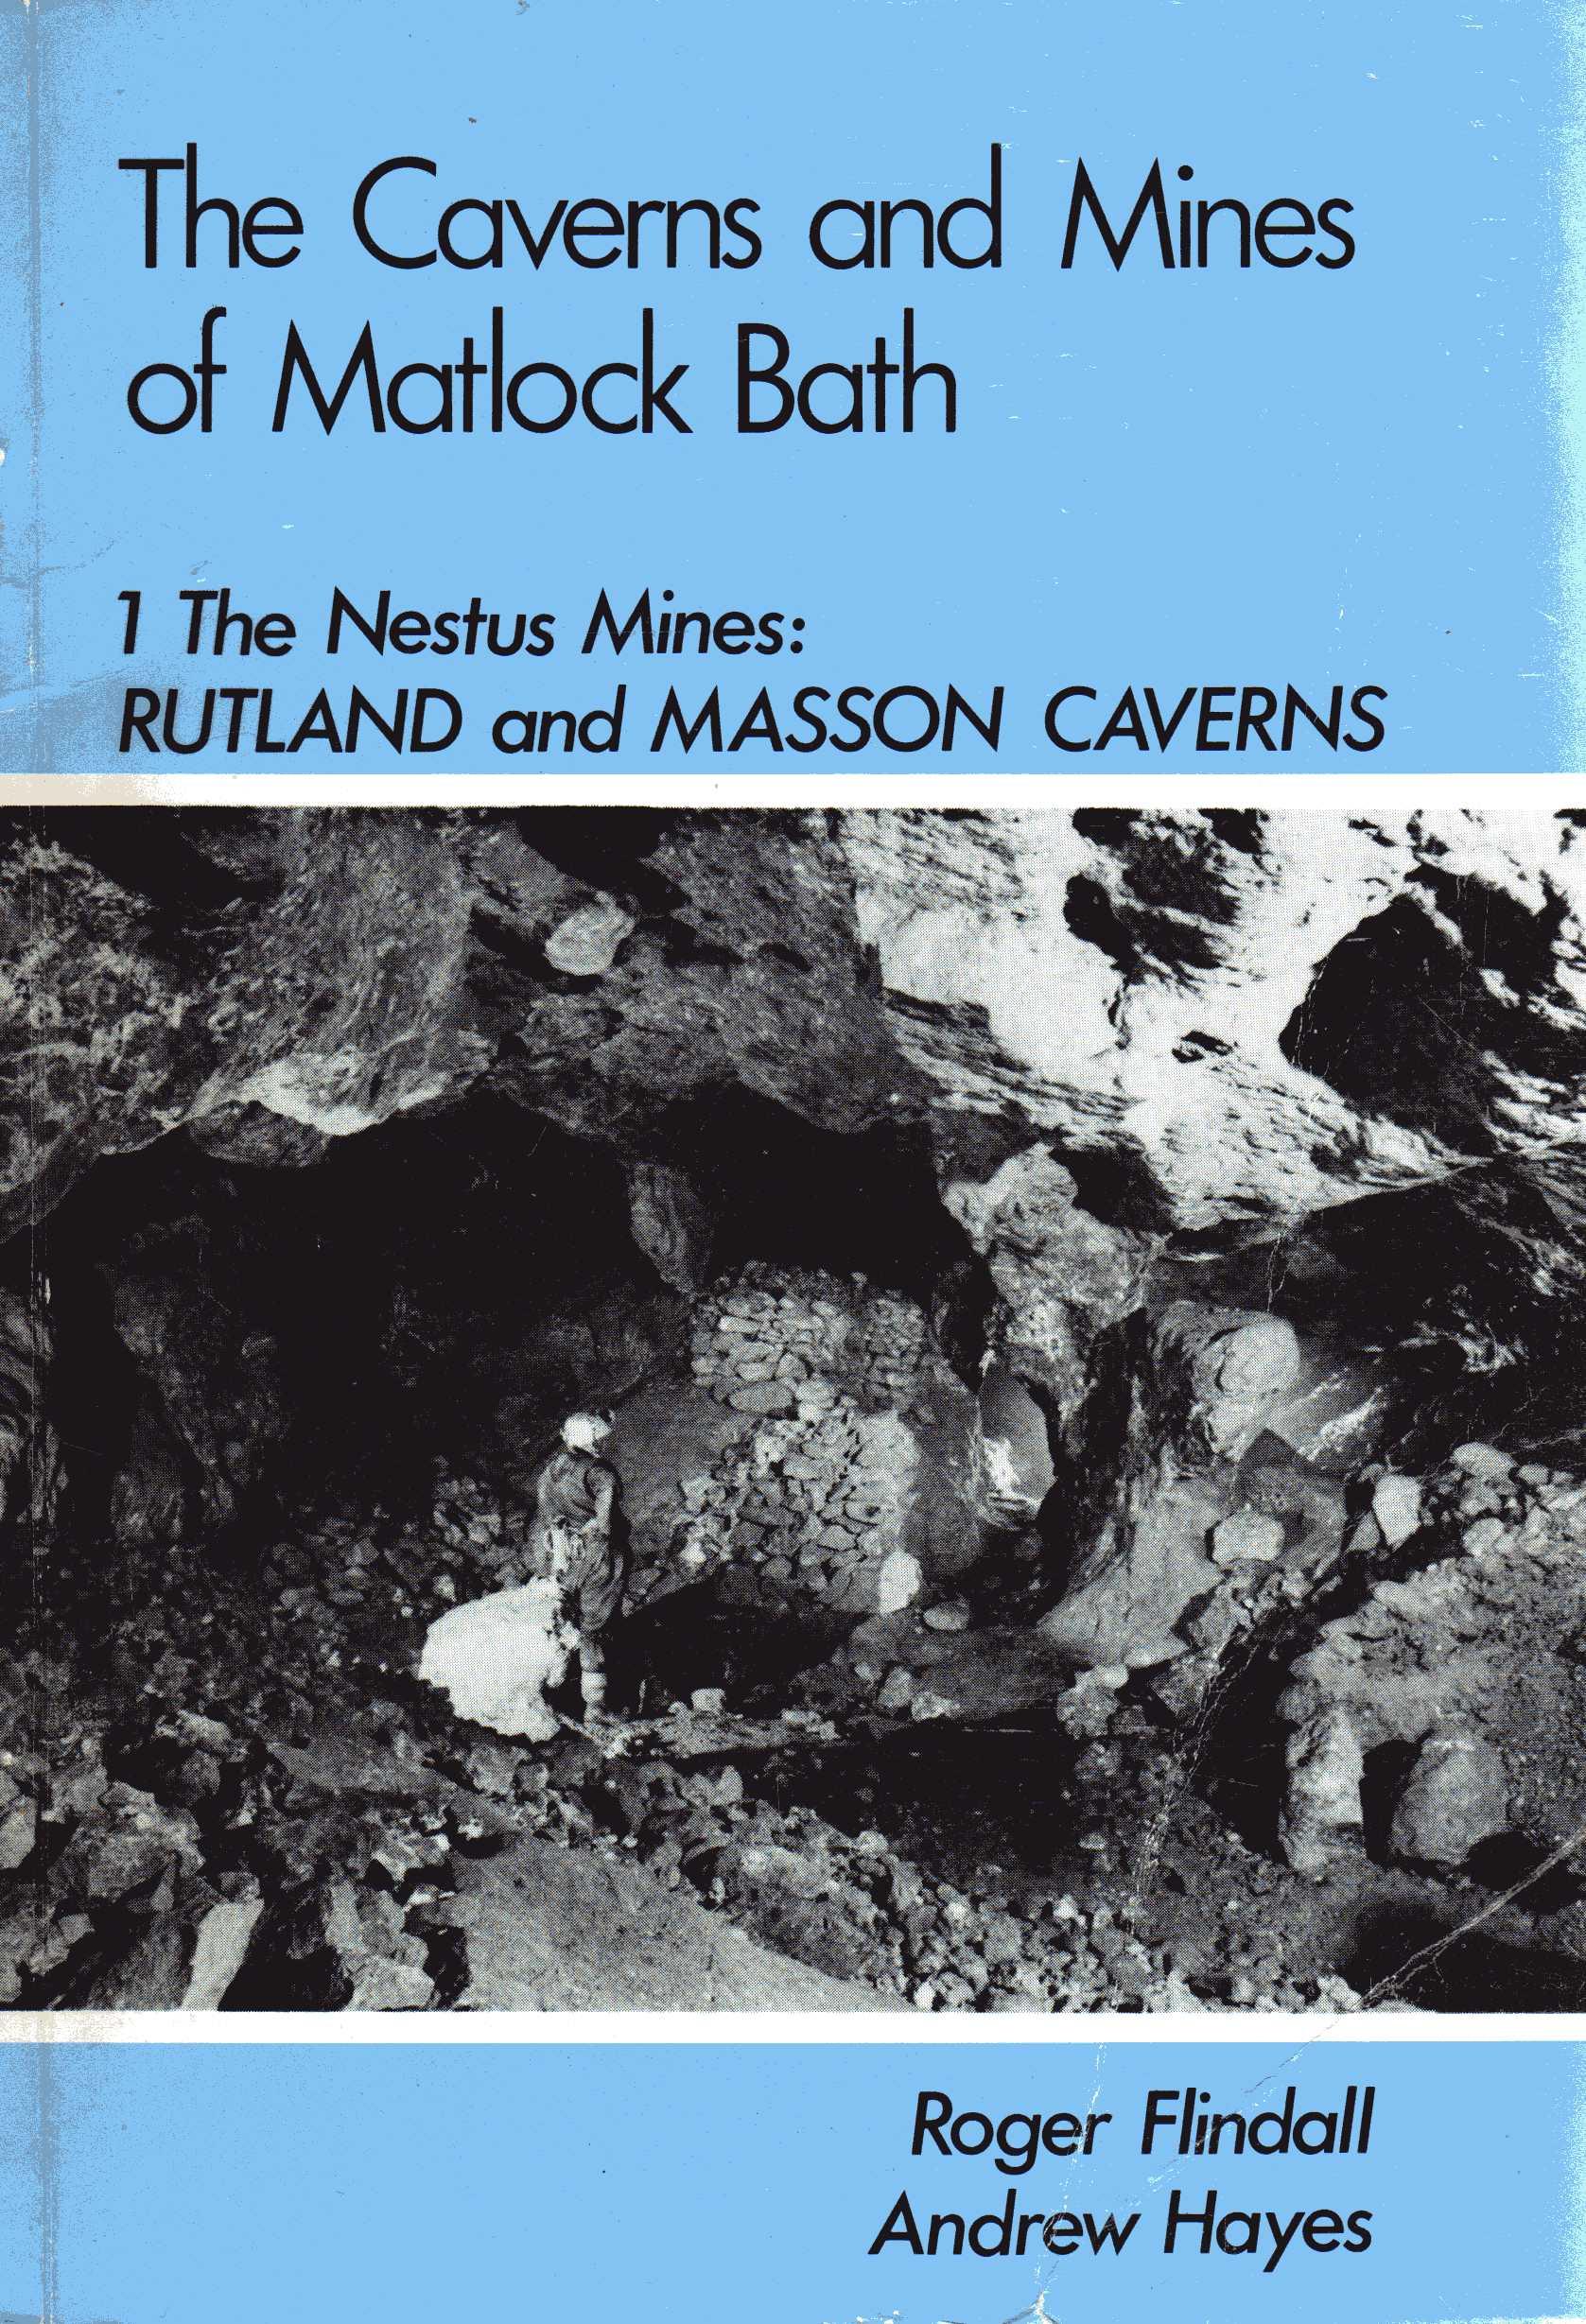 [USED] The Caverns and Mines of Matlock Bath, The Nestus Mines , Rutland and Masson Caverns